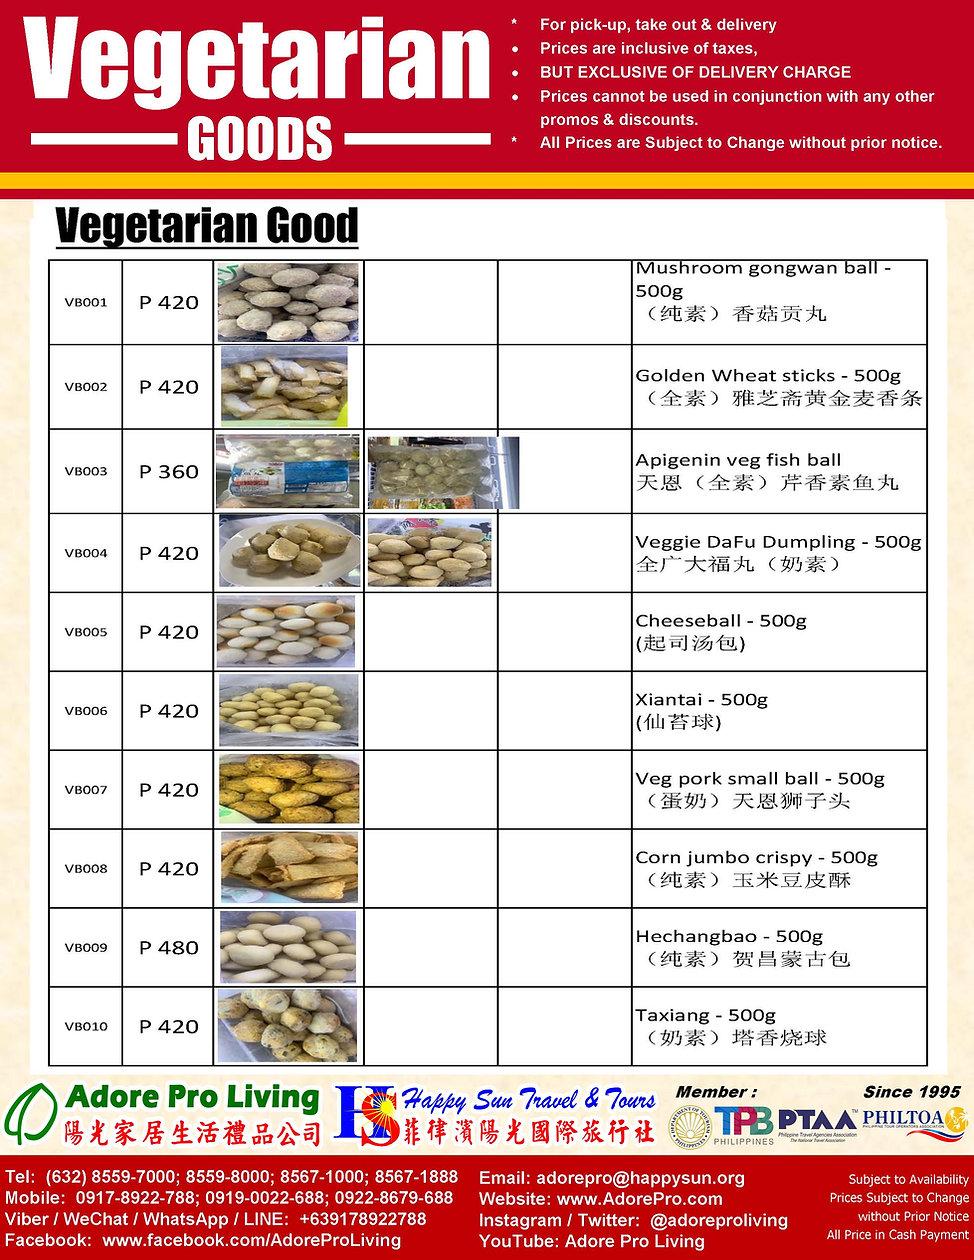 P4_Vegetarian Goods_20200929.jpg